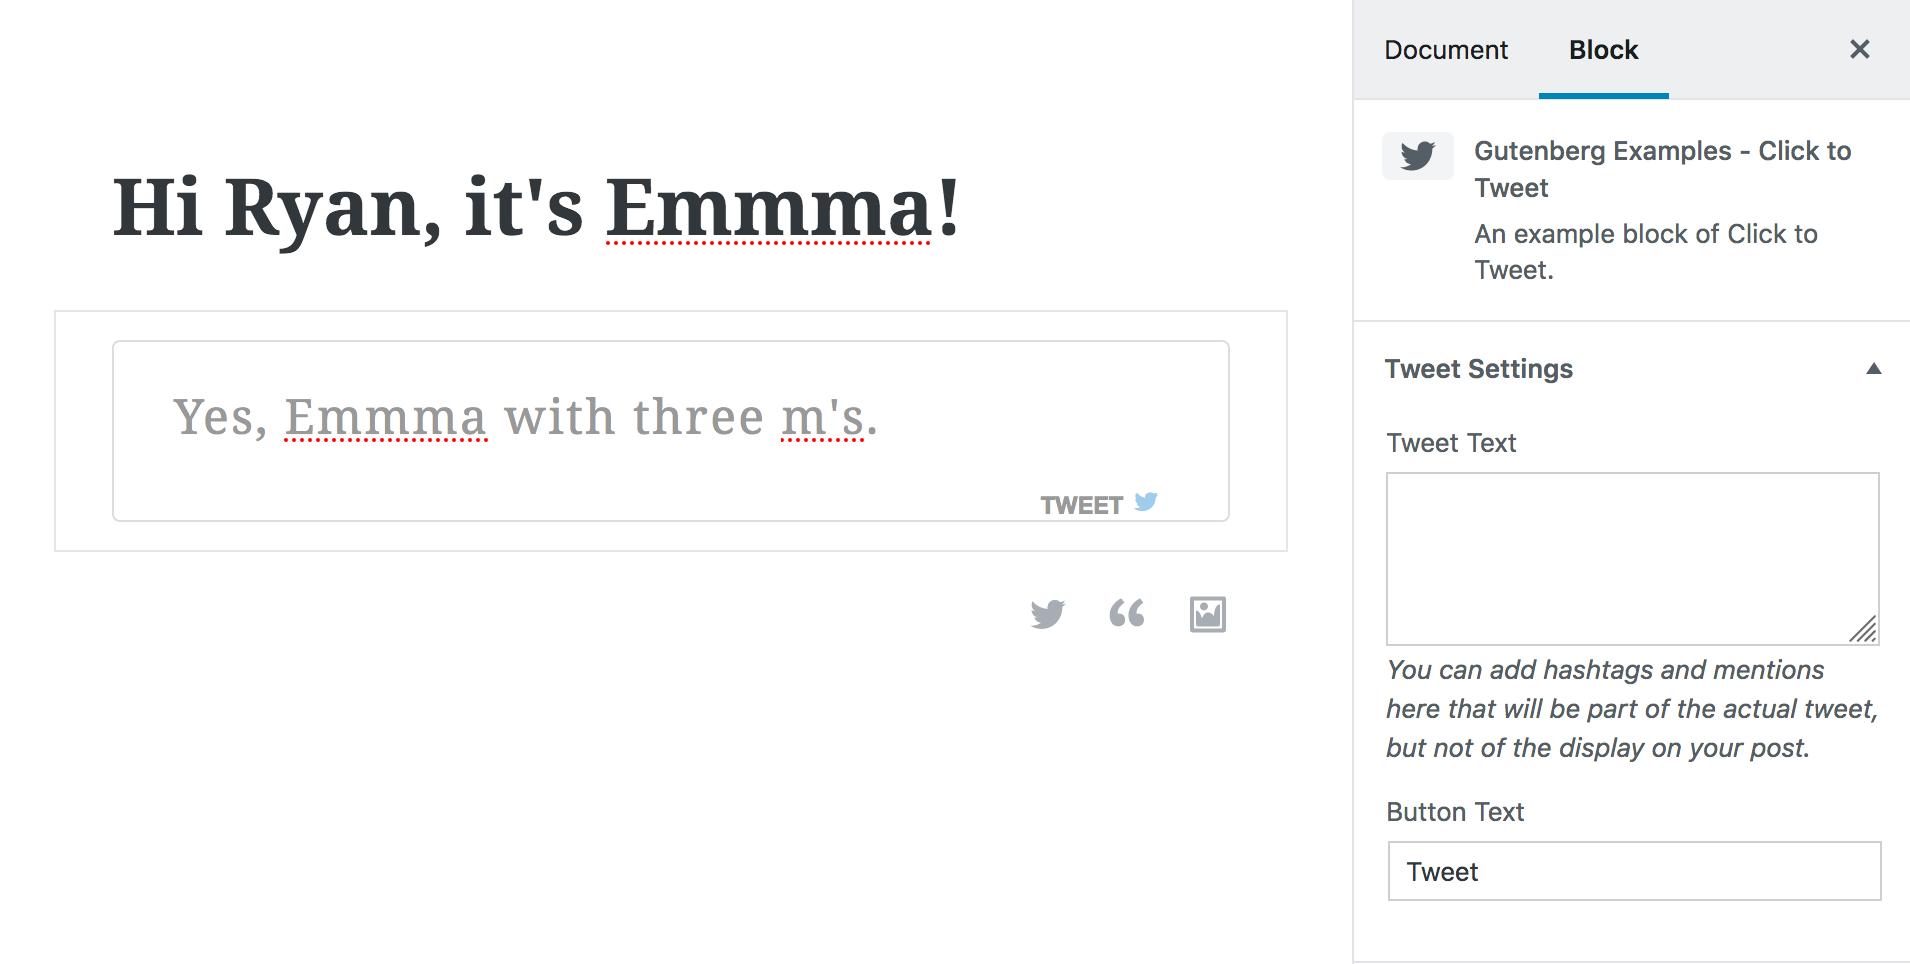 Gutenberg Click to Tweet Inspector Controls